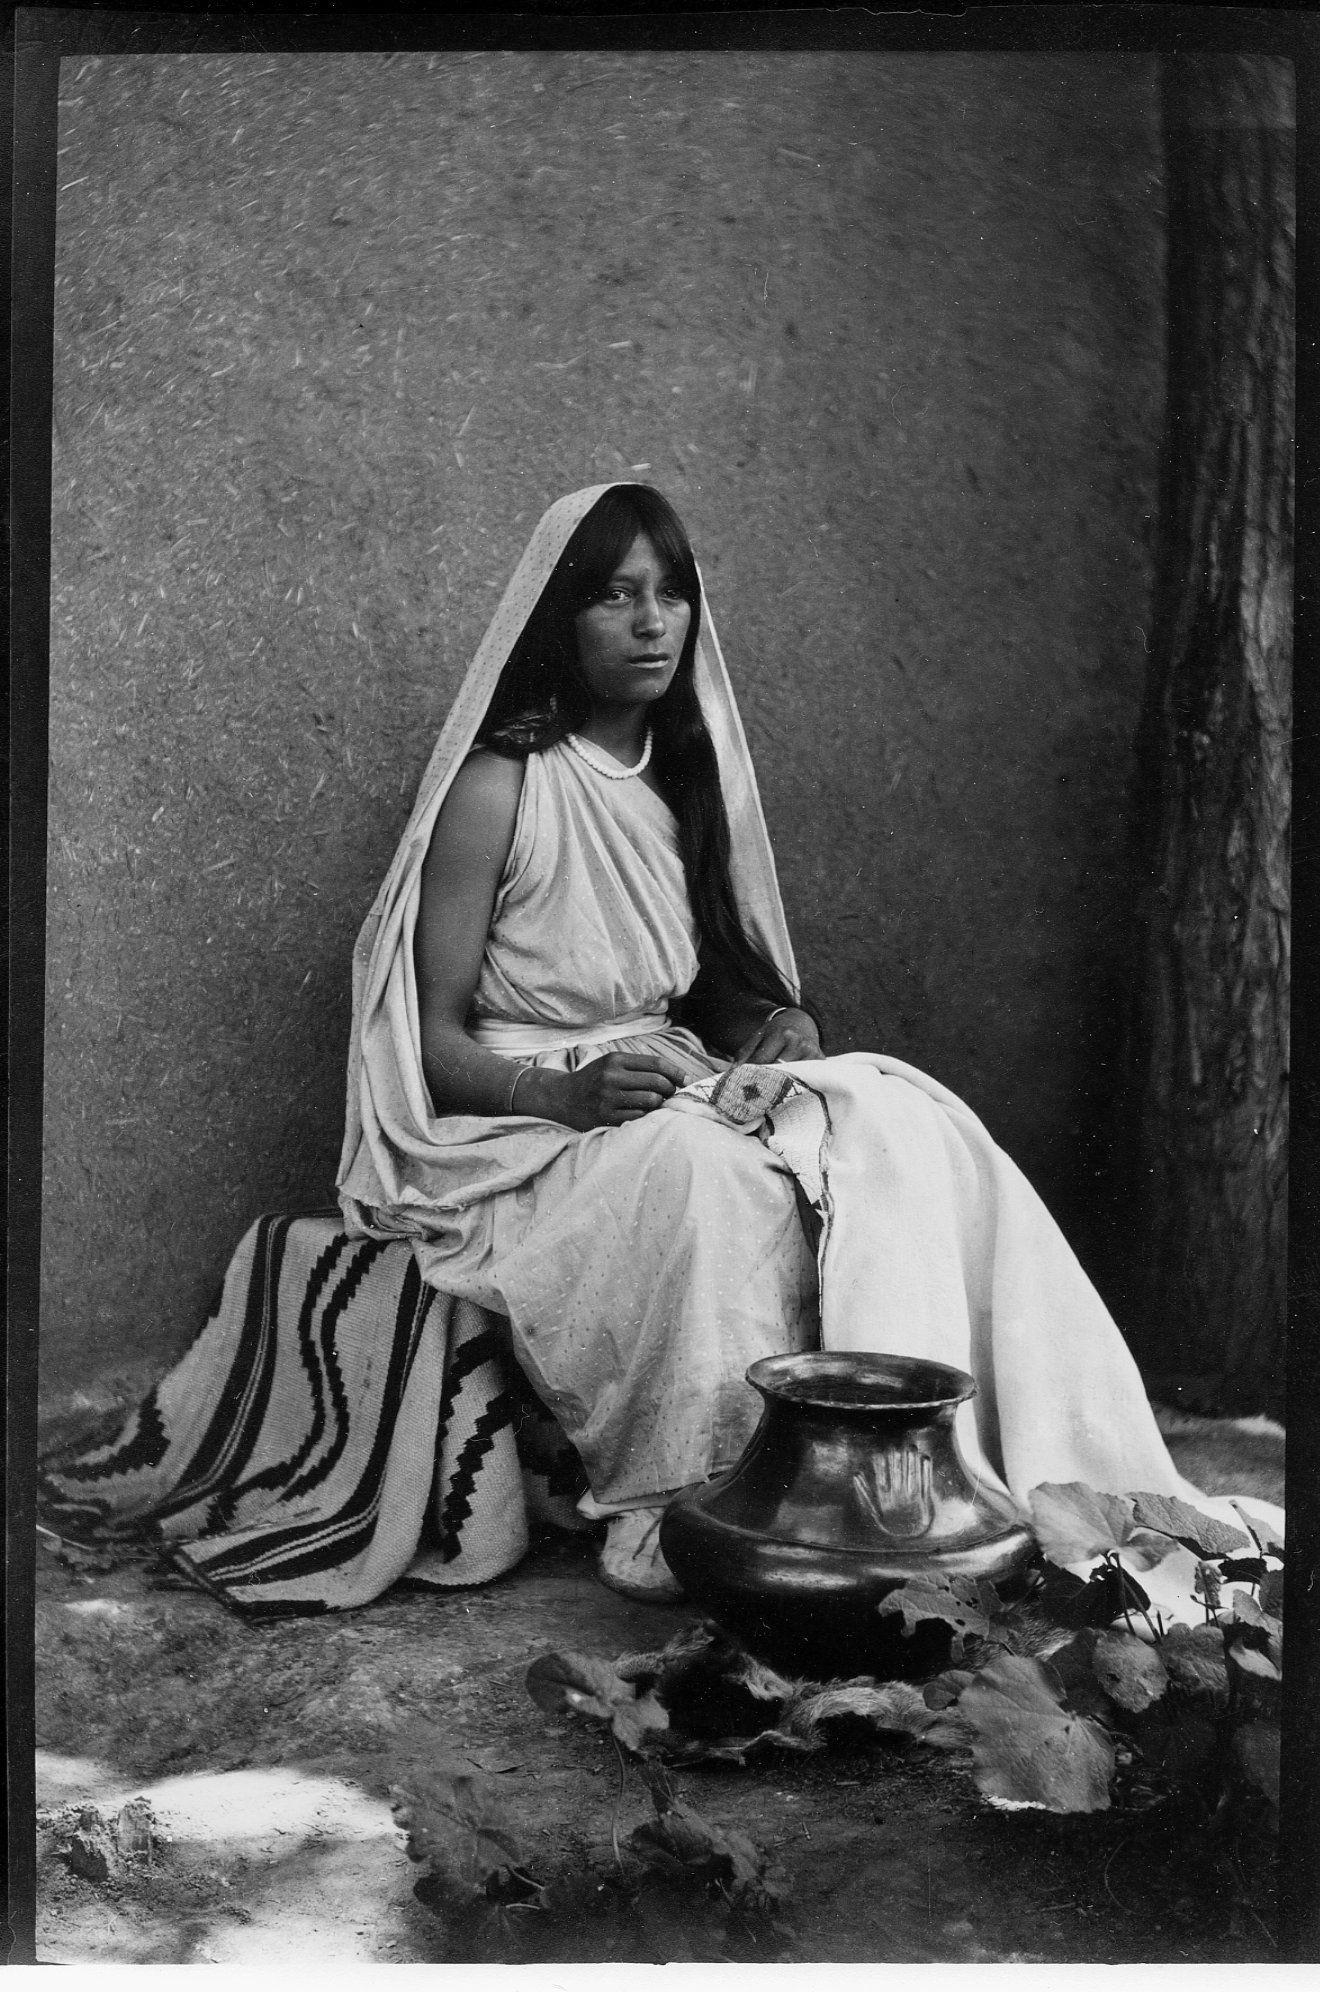 History taos pueblo native american children native